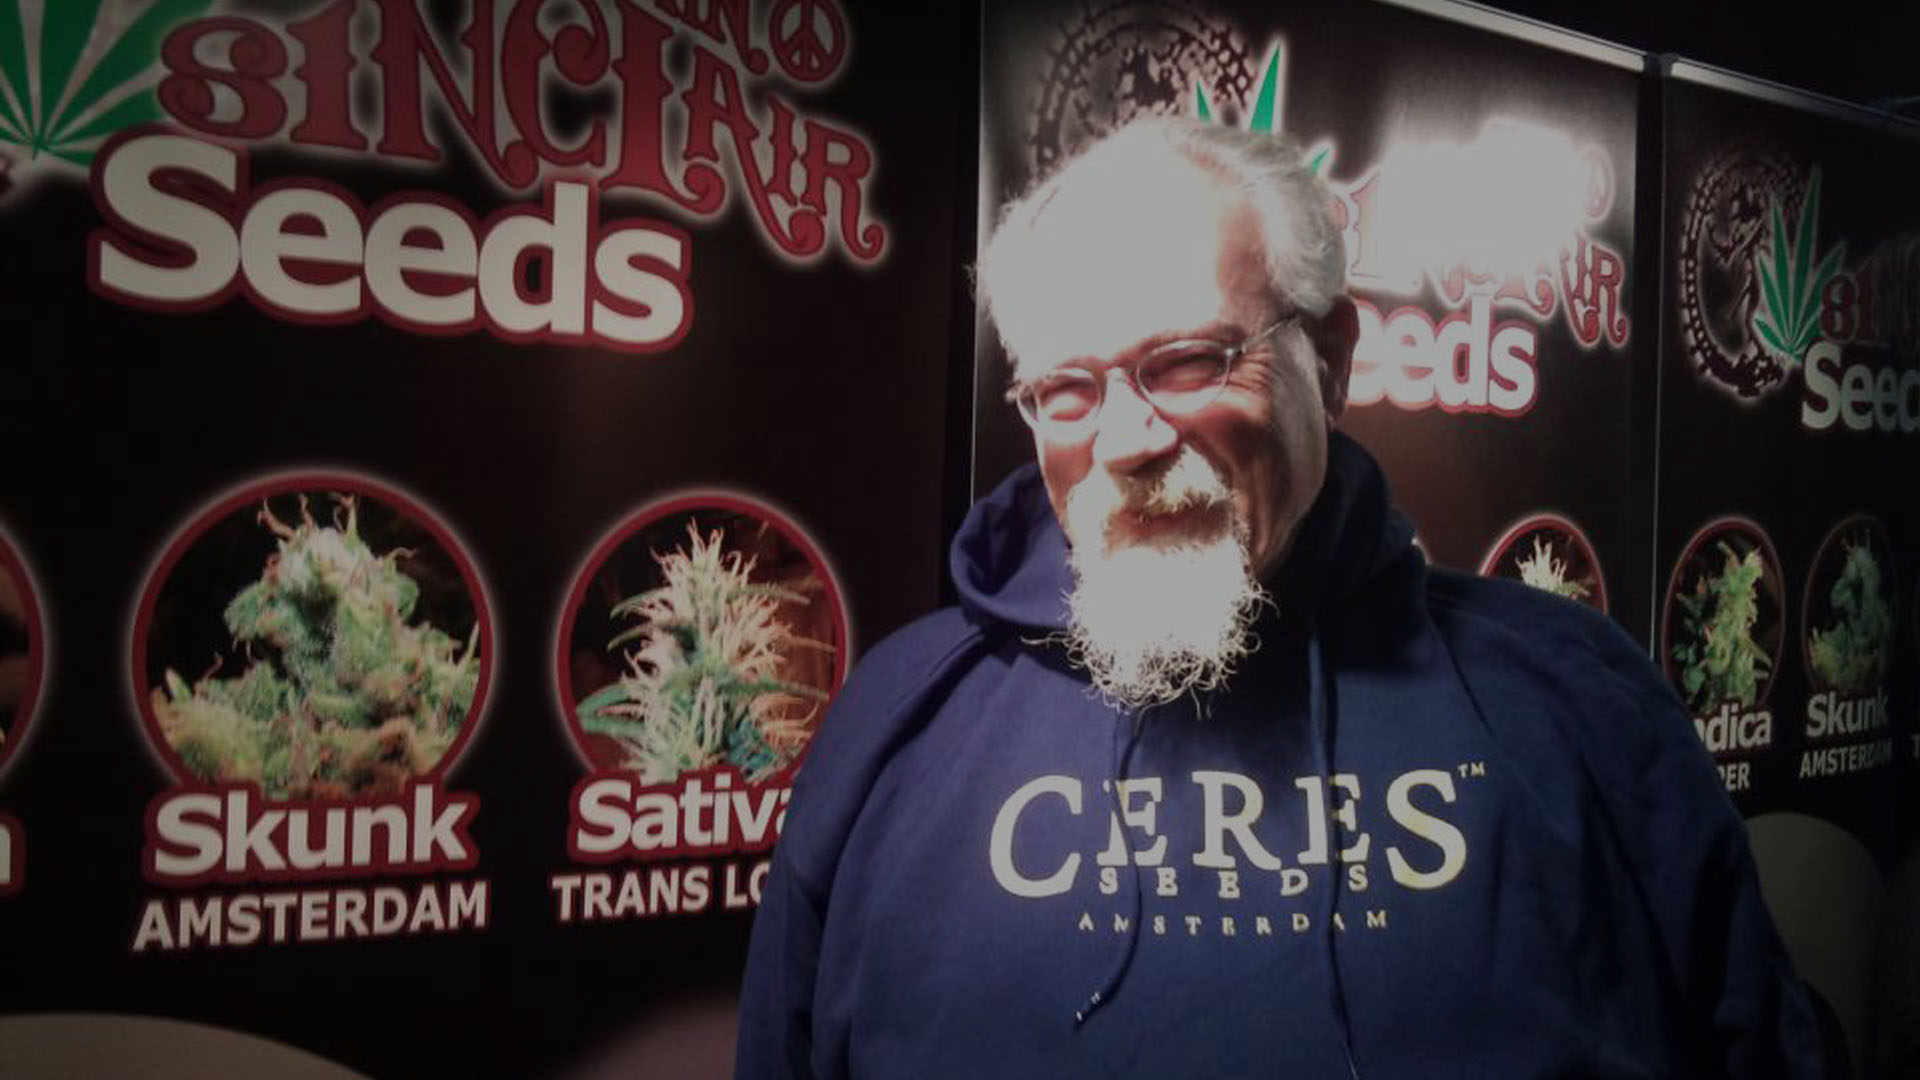 John Sinclair - John Sinclair Seeds Amsterdam